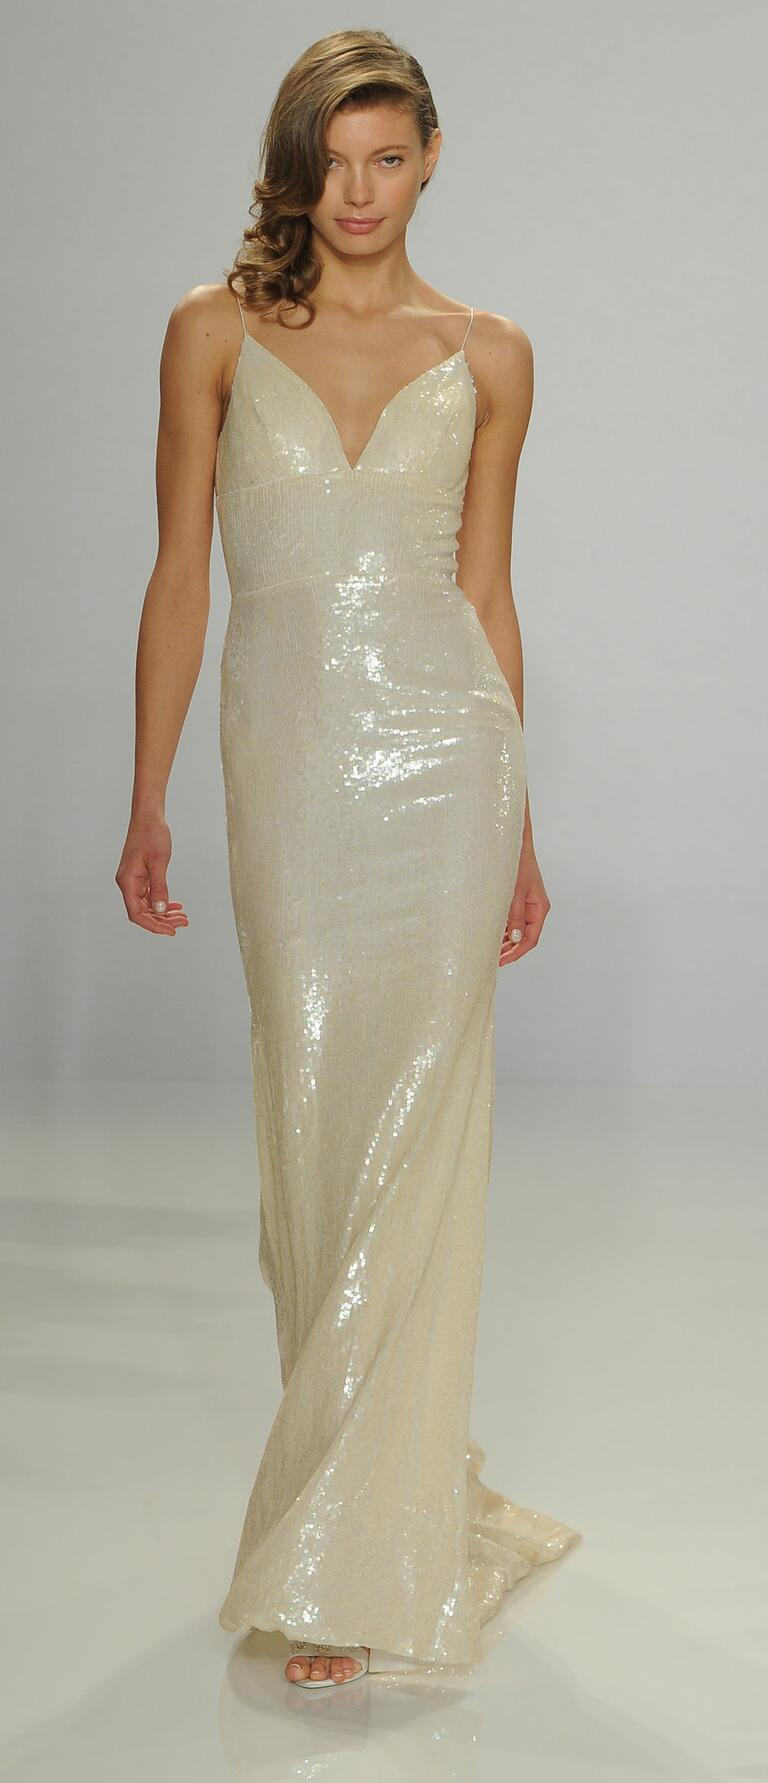 Christian Siriano Spring 2017 ombré sequin slip wedding dress